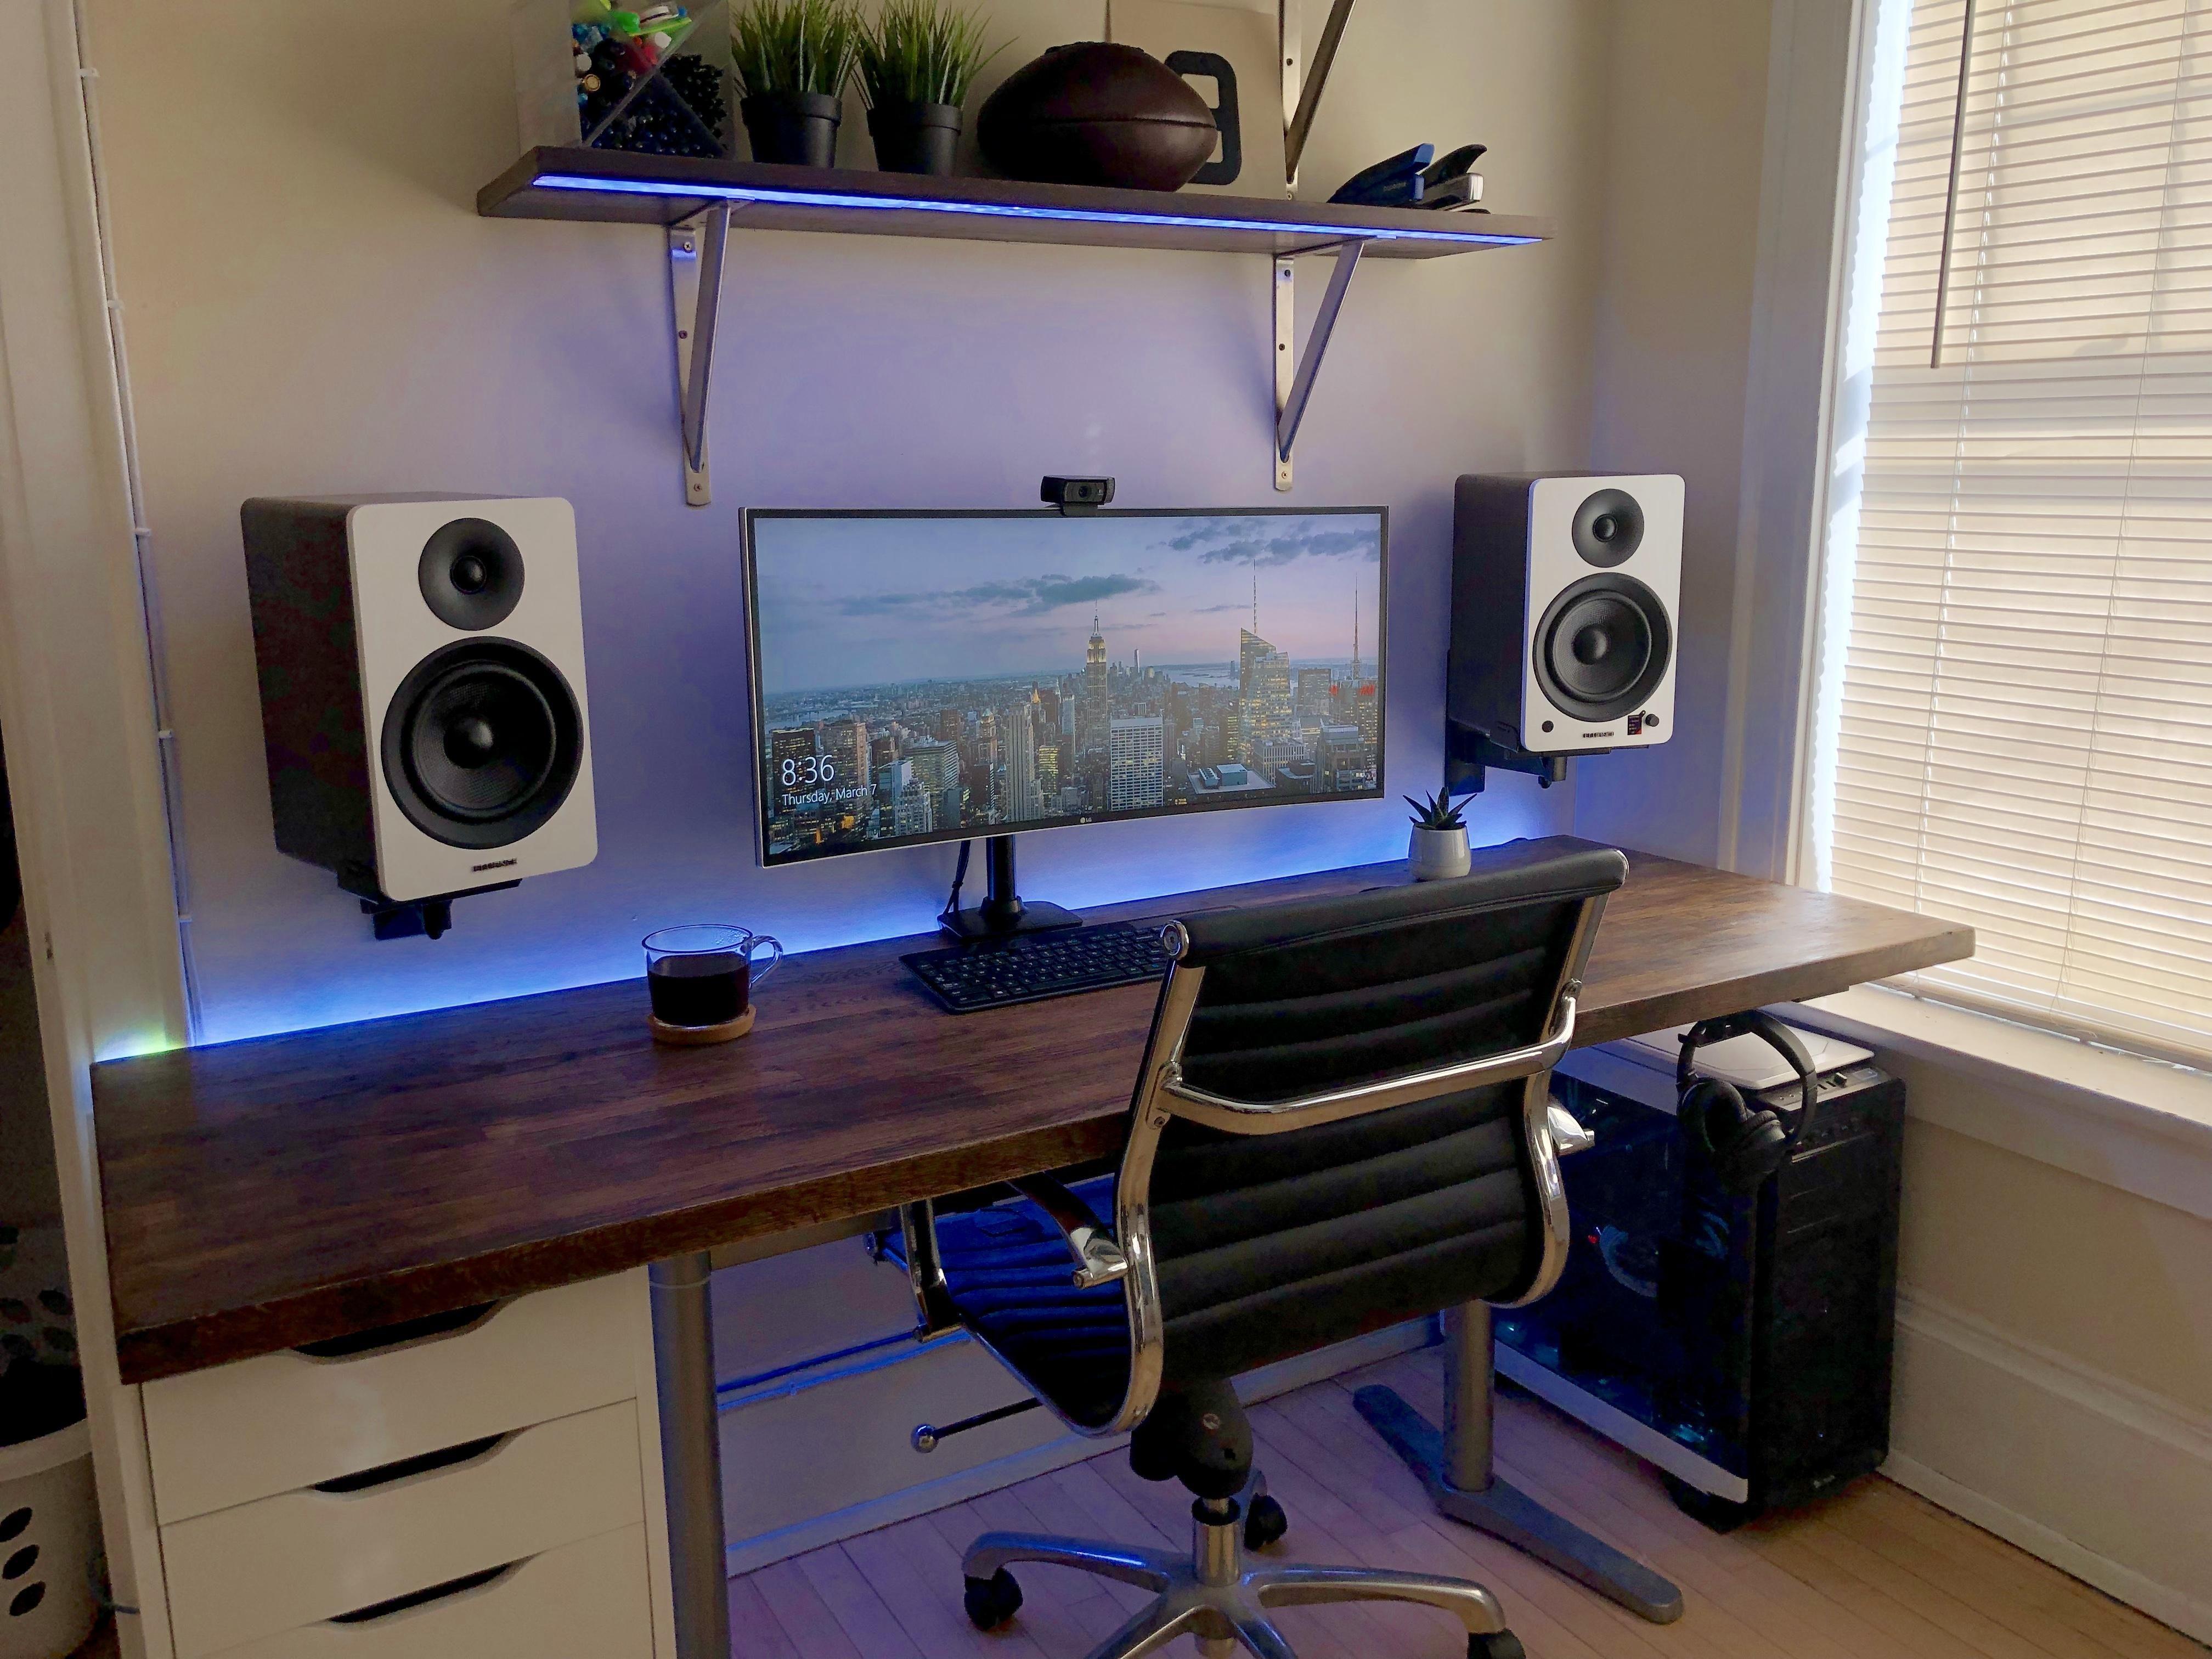 Clean Walnut & White battlestations Home office setup